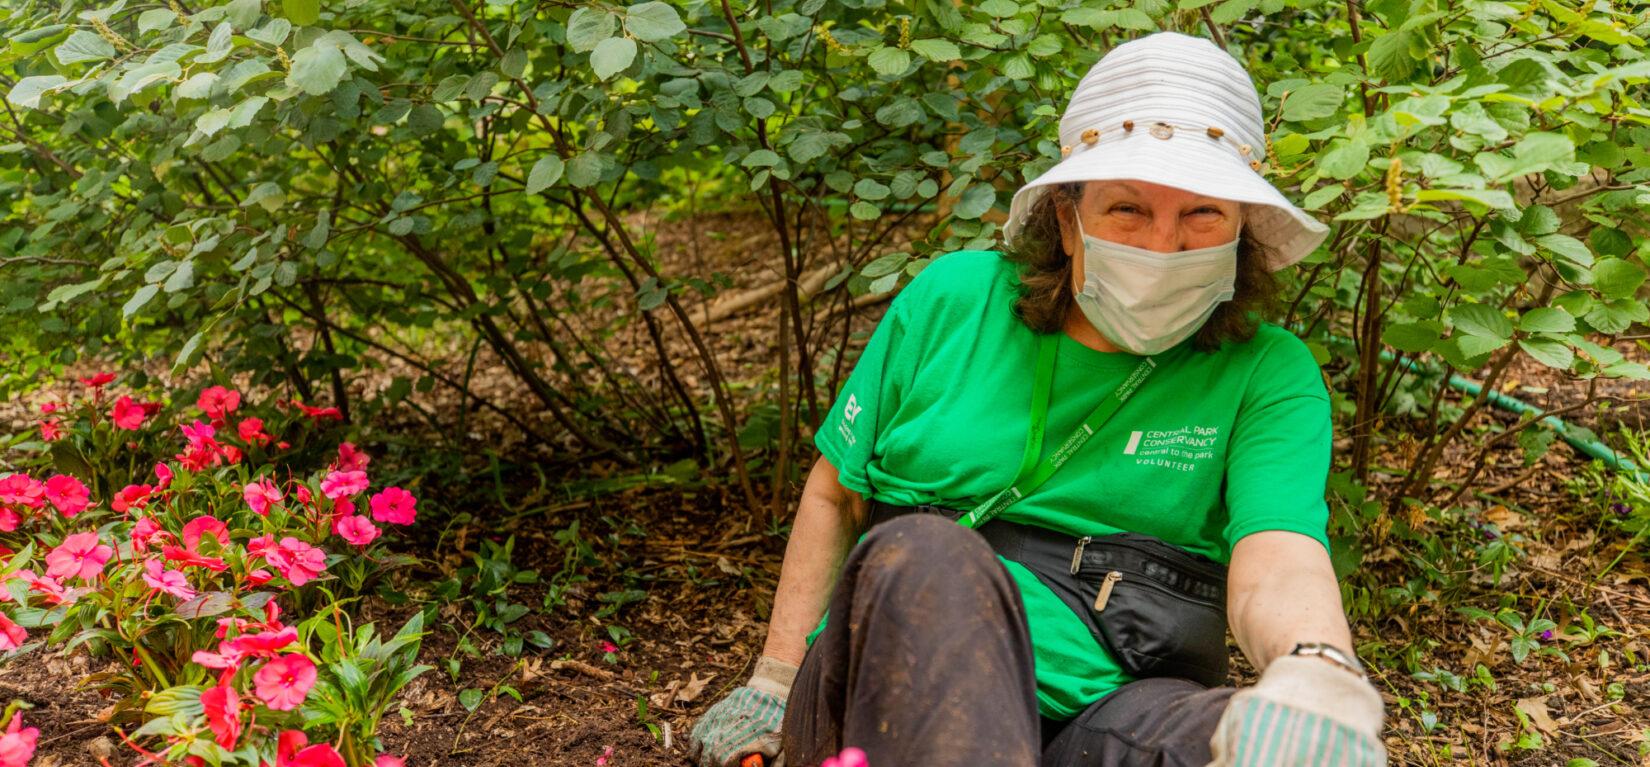 A landscape volunteer at work in a flowerbed